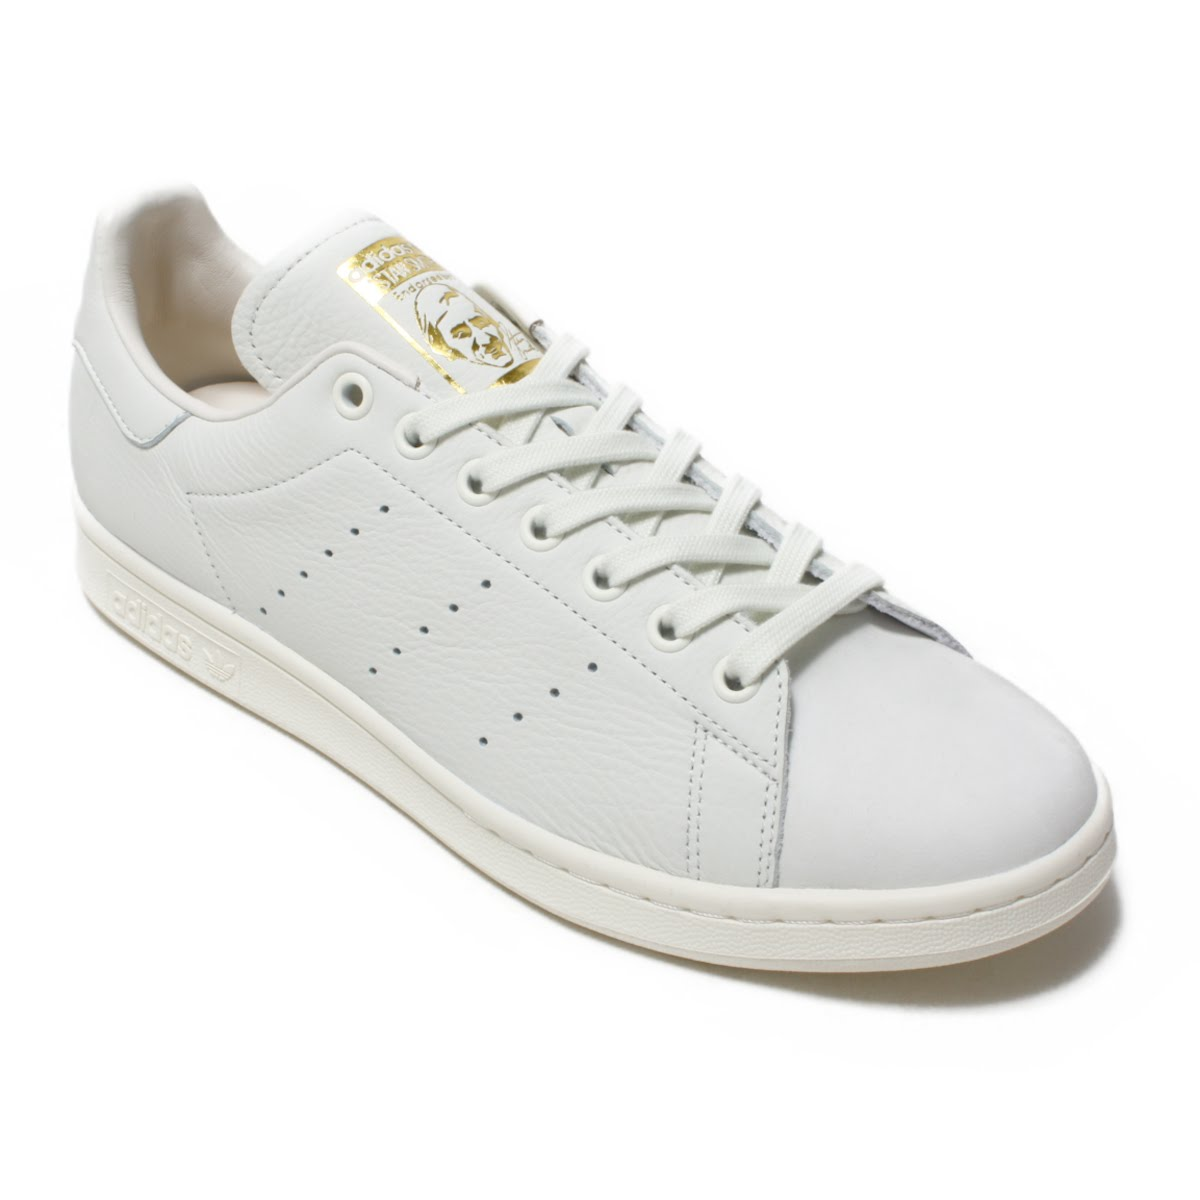 adidas Originals Stan Smith Premium(アディダス オリジナルス スタンスミス プレミアム)WHITE TINT/WHITE TINT/GOLD MET【メンズ レディース スニーカー】18FW-I